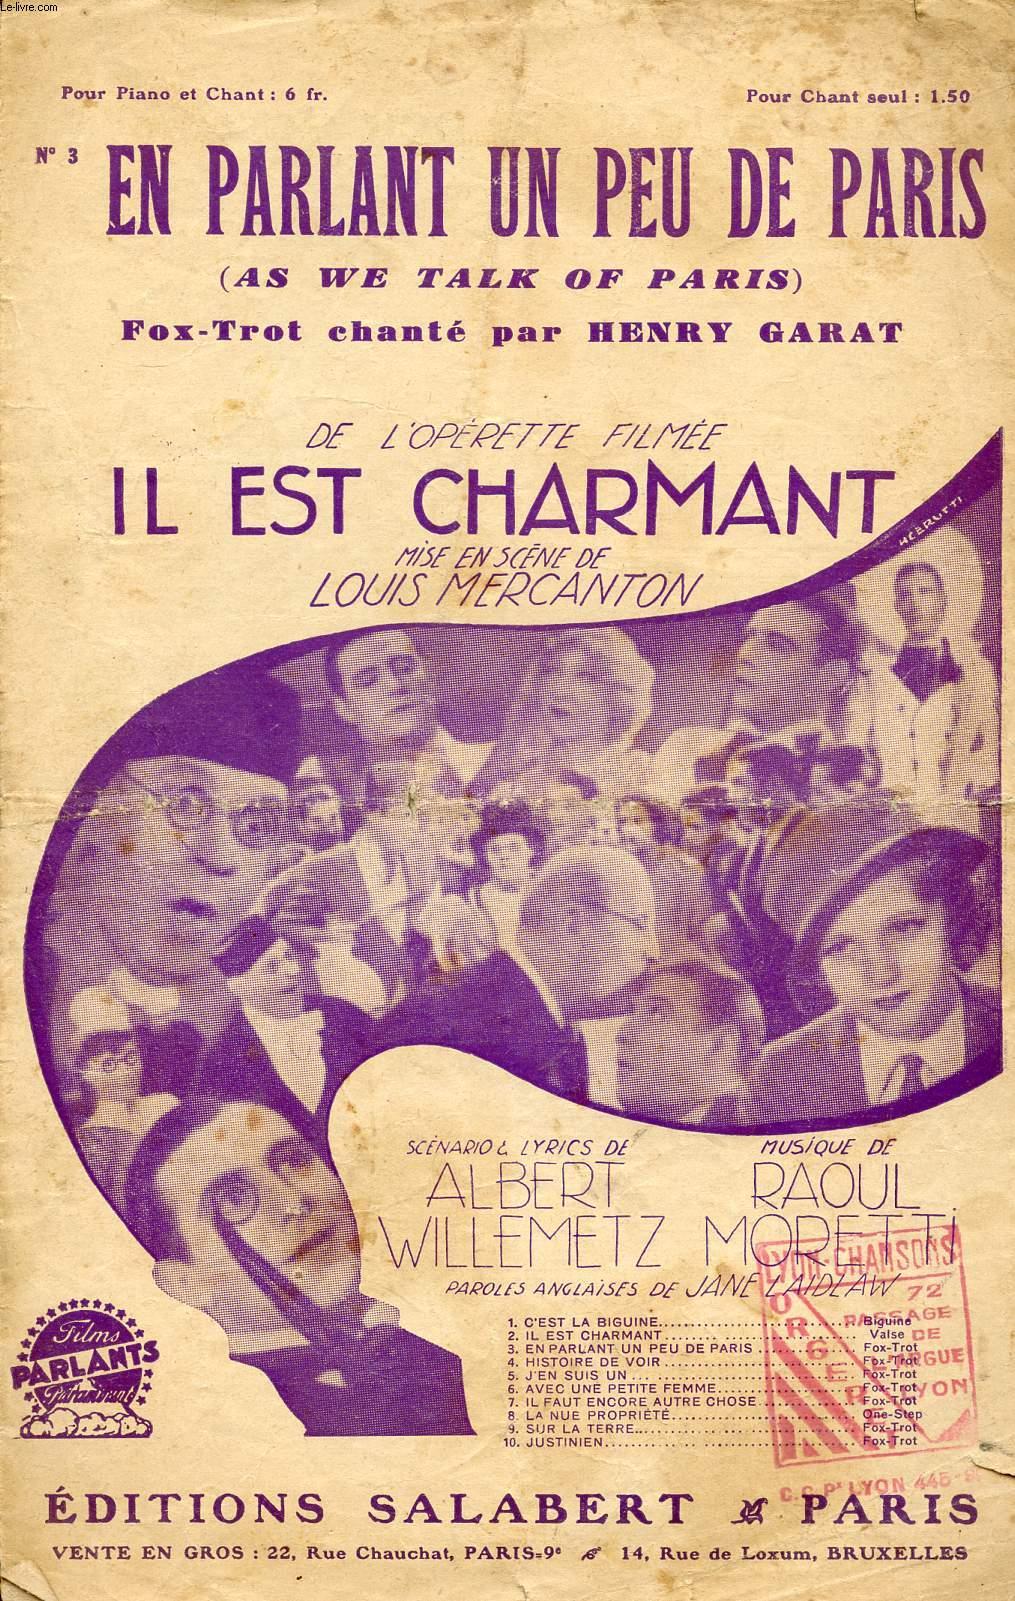 EN PARLANT UN PEU DE PARIS - FOX TROT CHANTE N°3